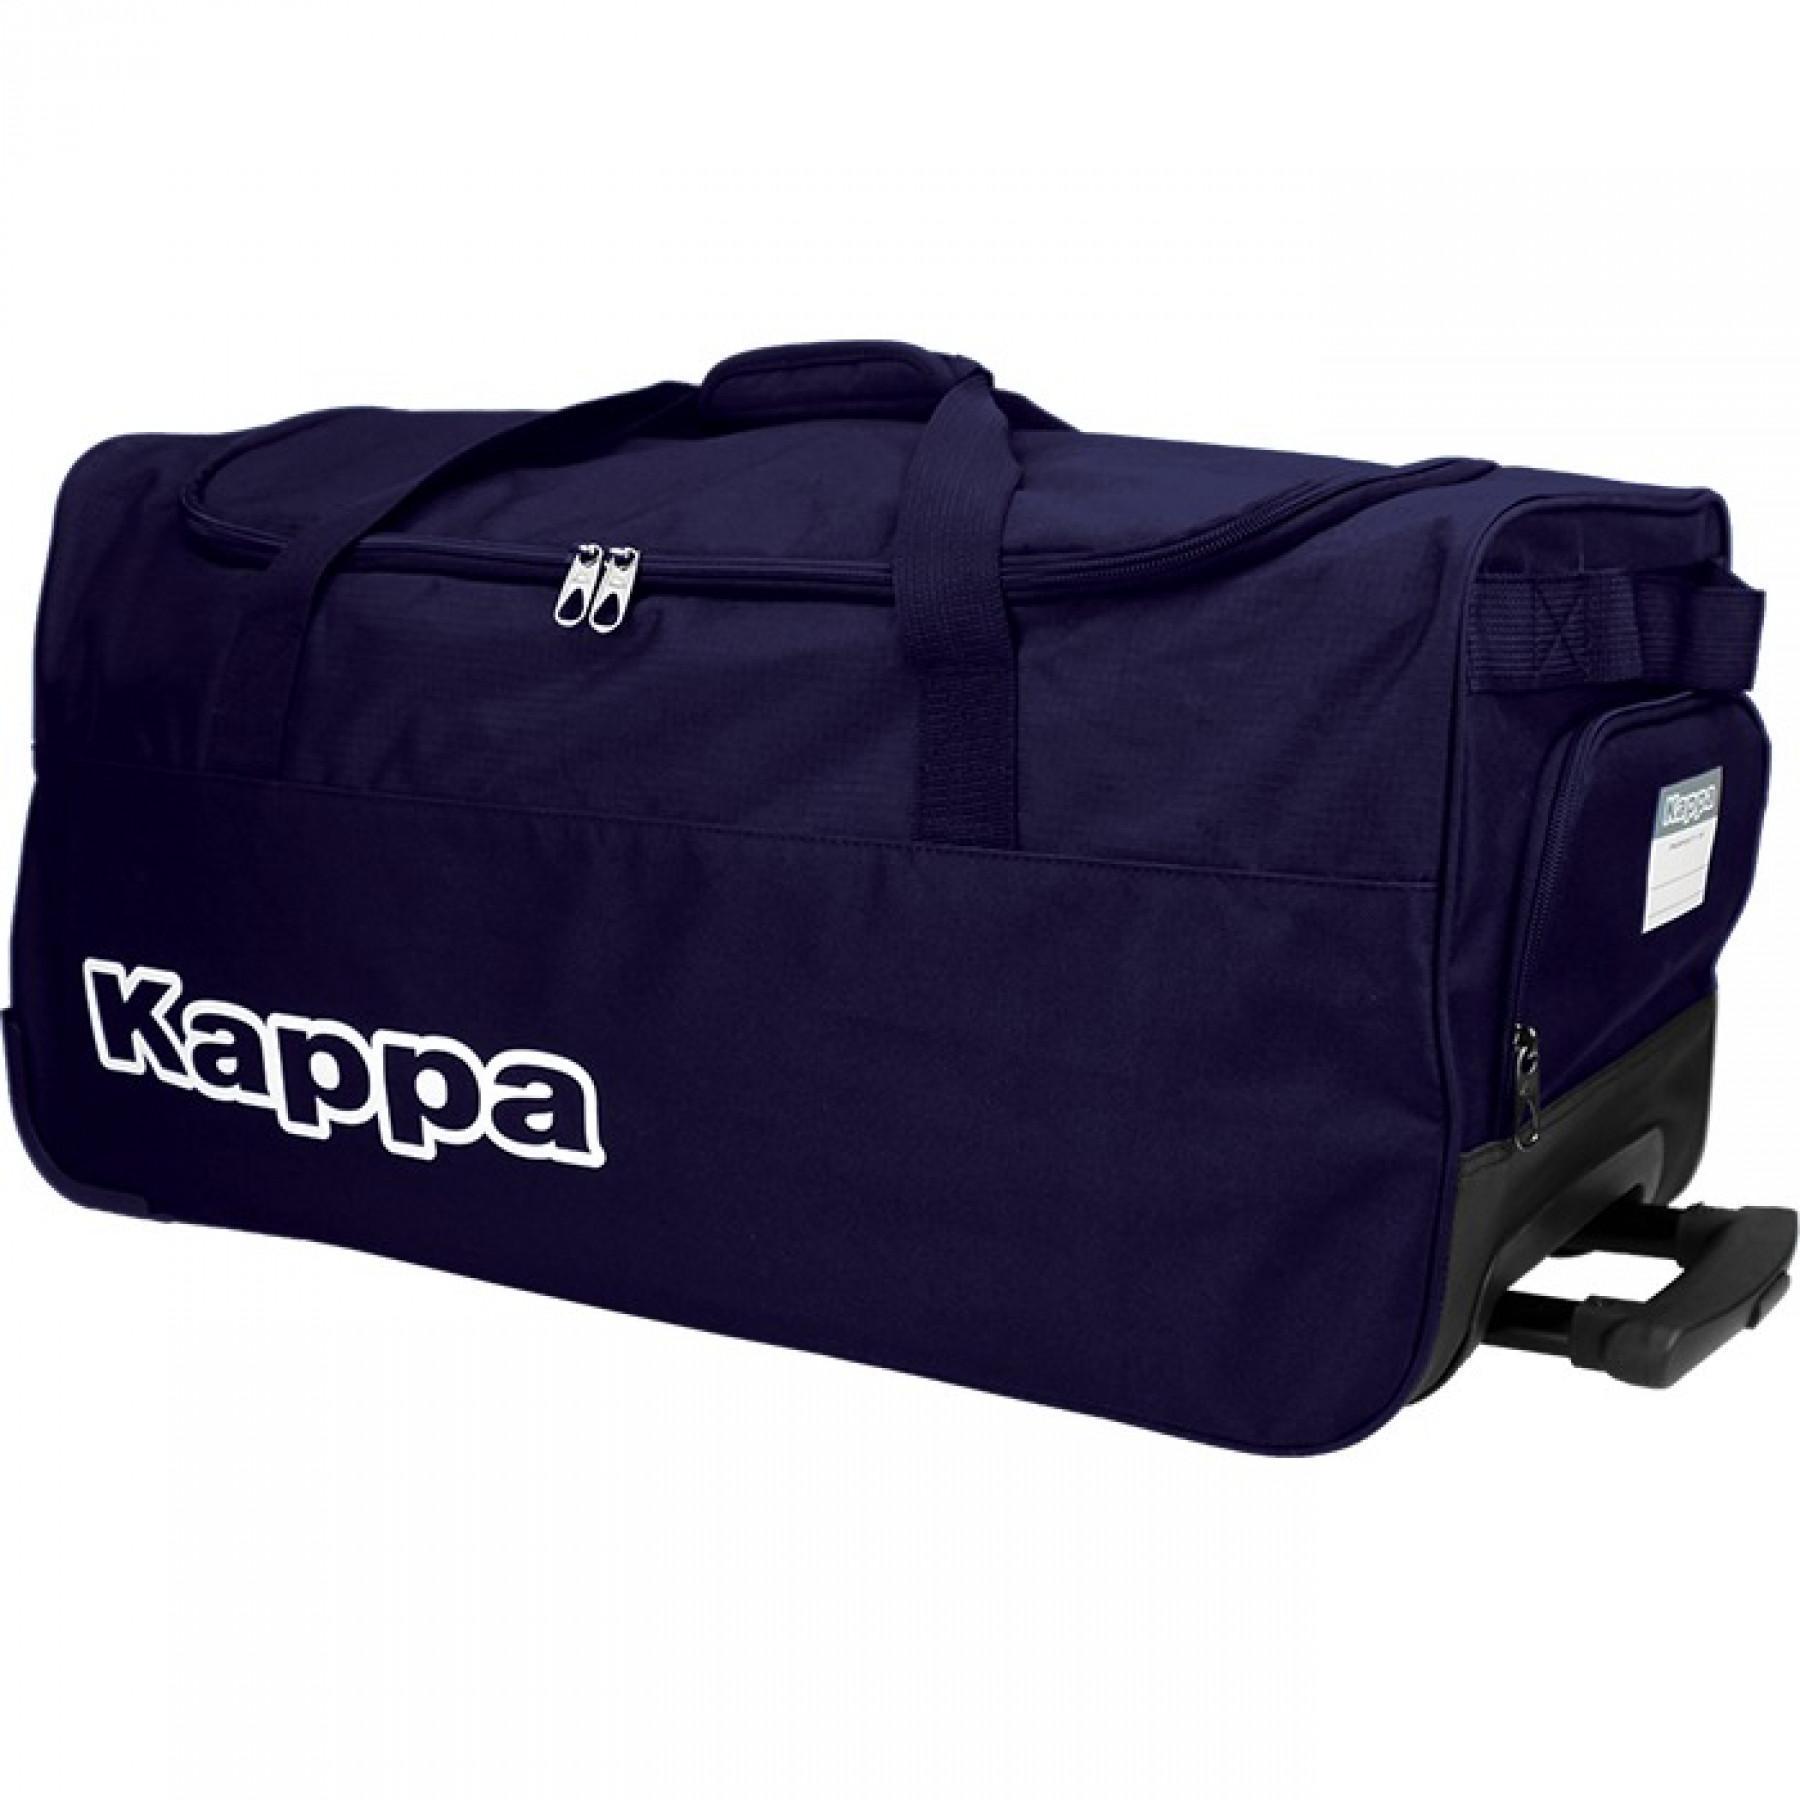 Rolling bag medium Kappa Tarcisio